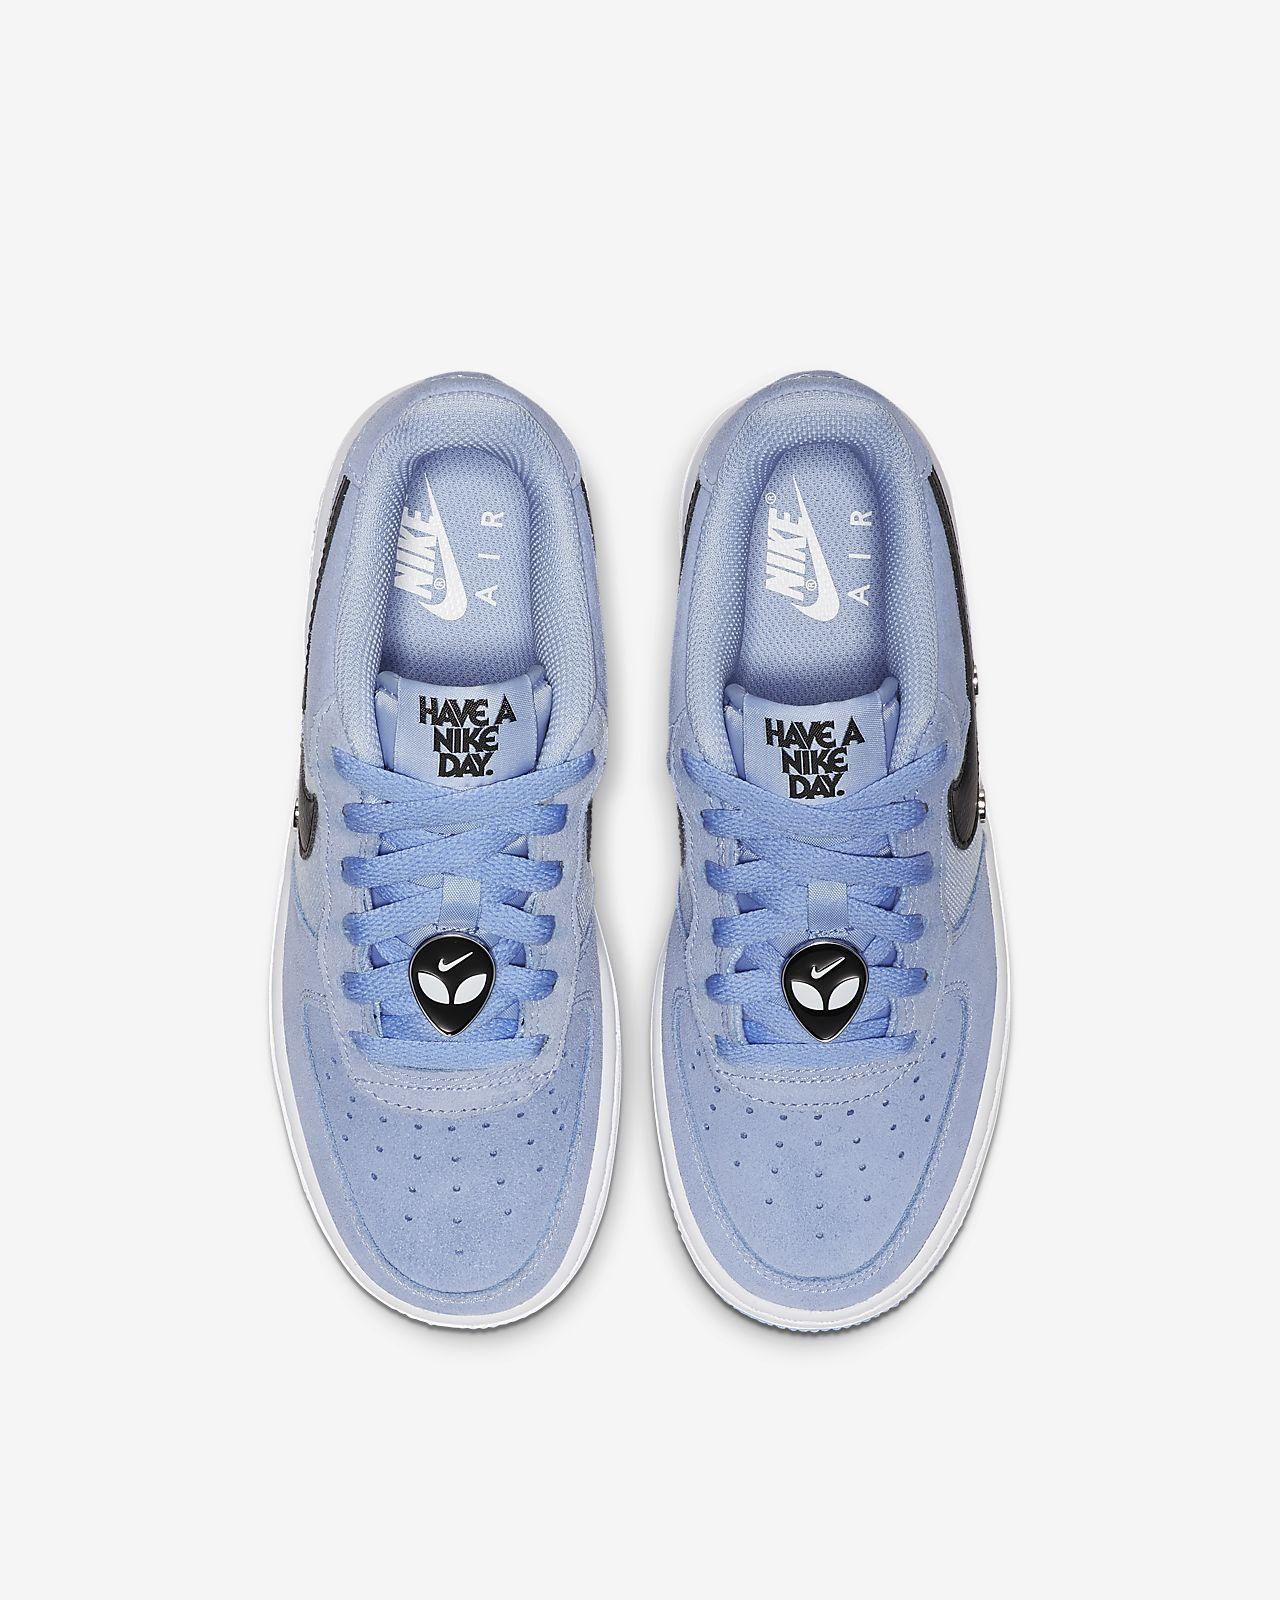 brand new 67a13 9cb51 Nike Air Force 1 LV8 Older Kids' Shoe. Nike.com GB